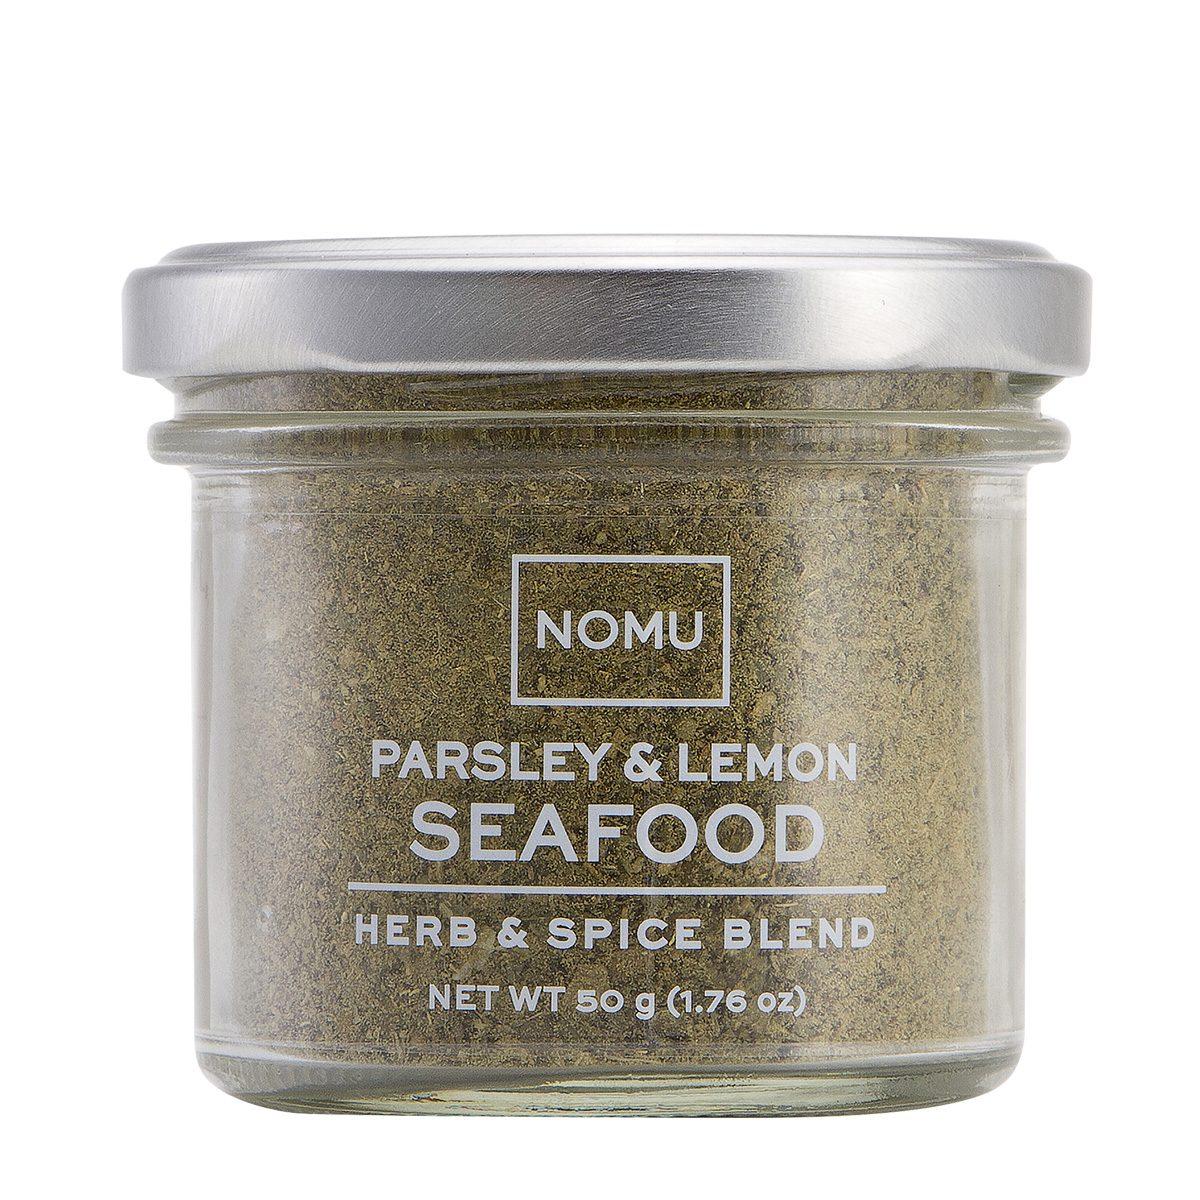 Parsley-&-Lemon-Seafood-Blend1